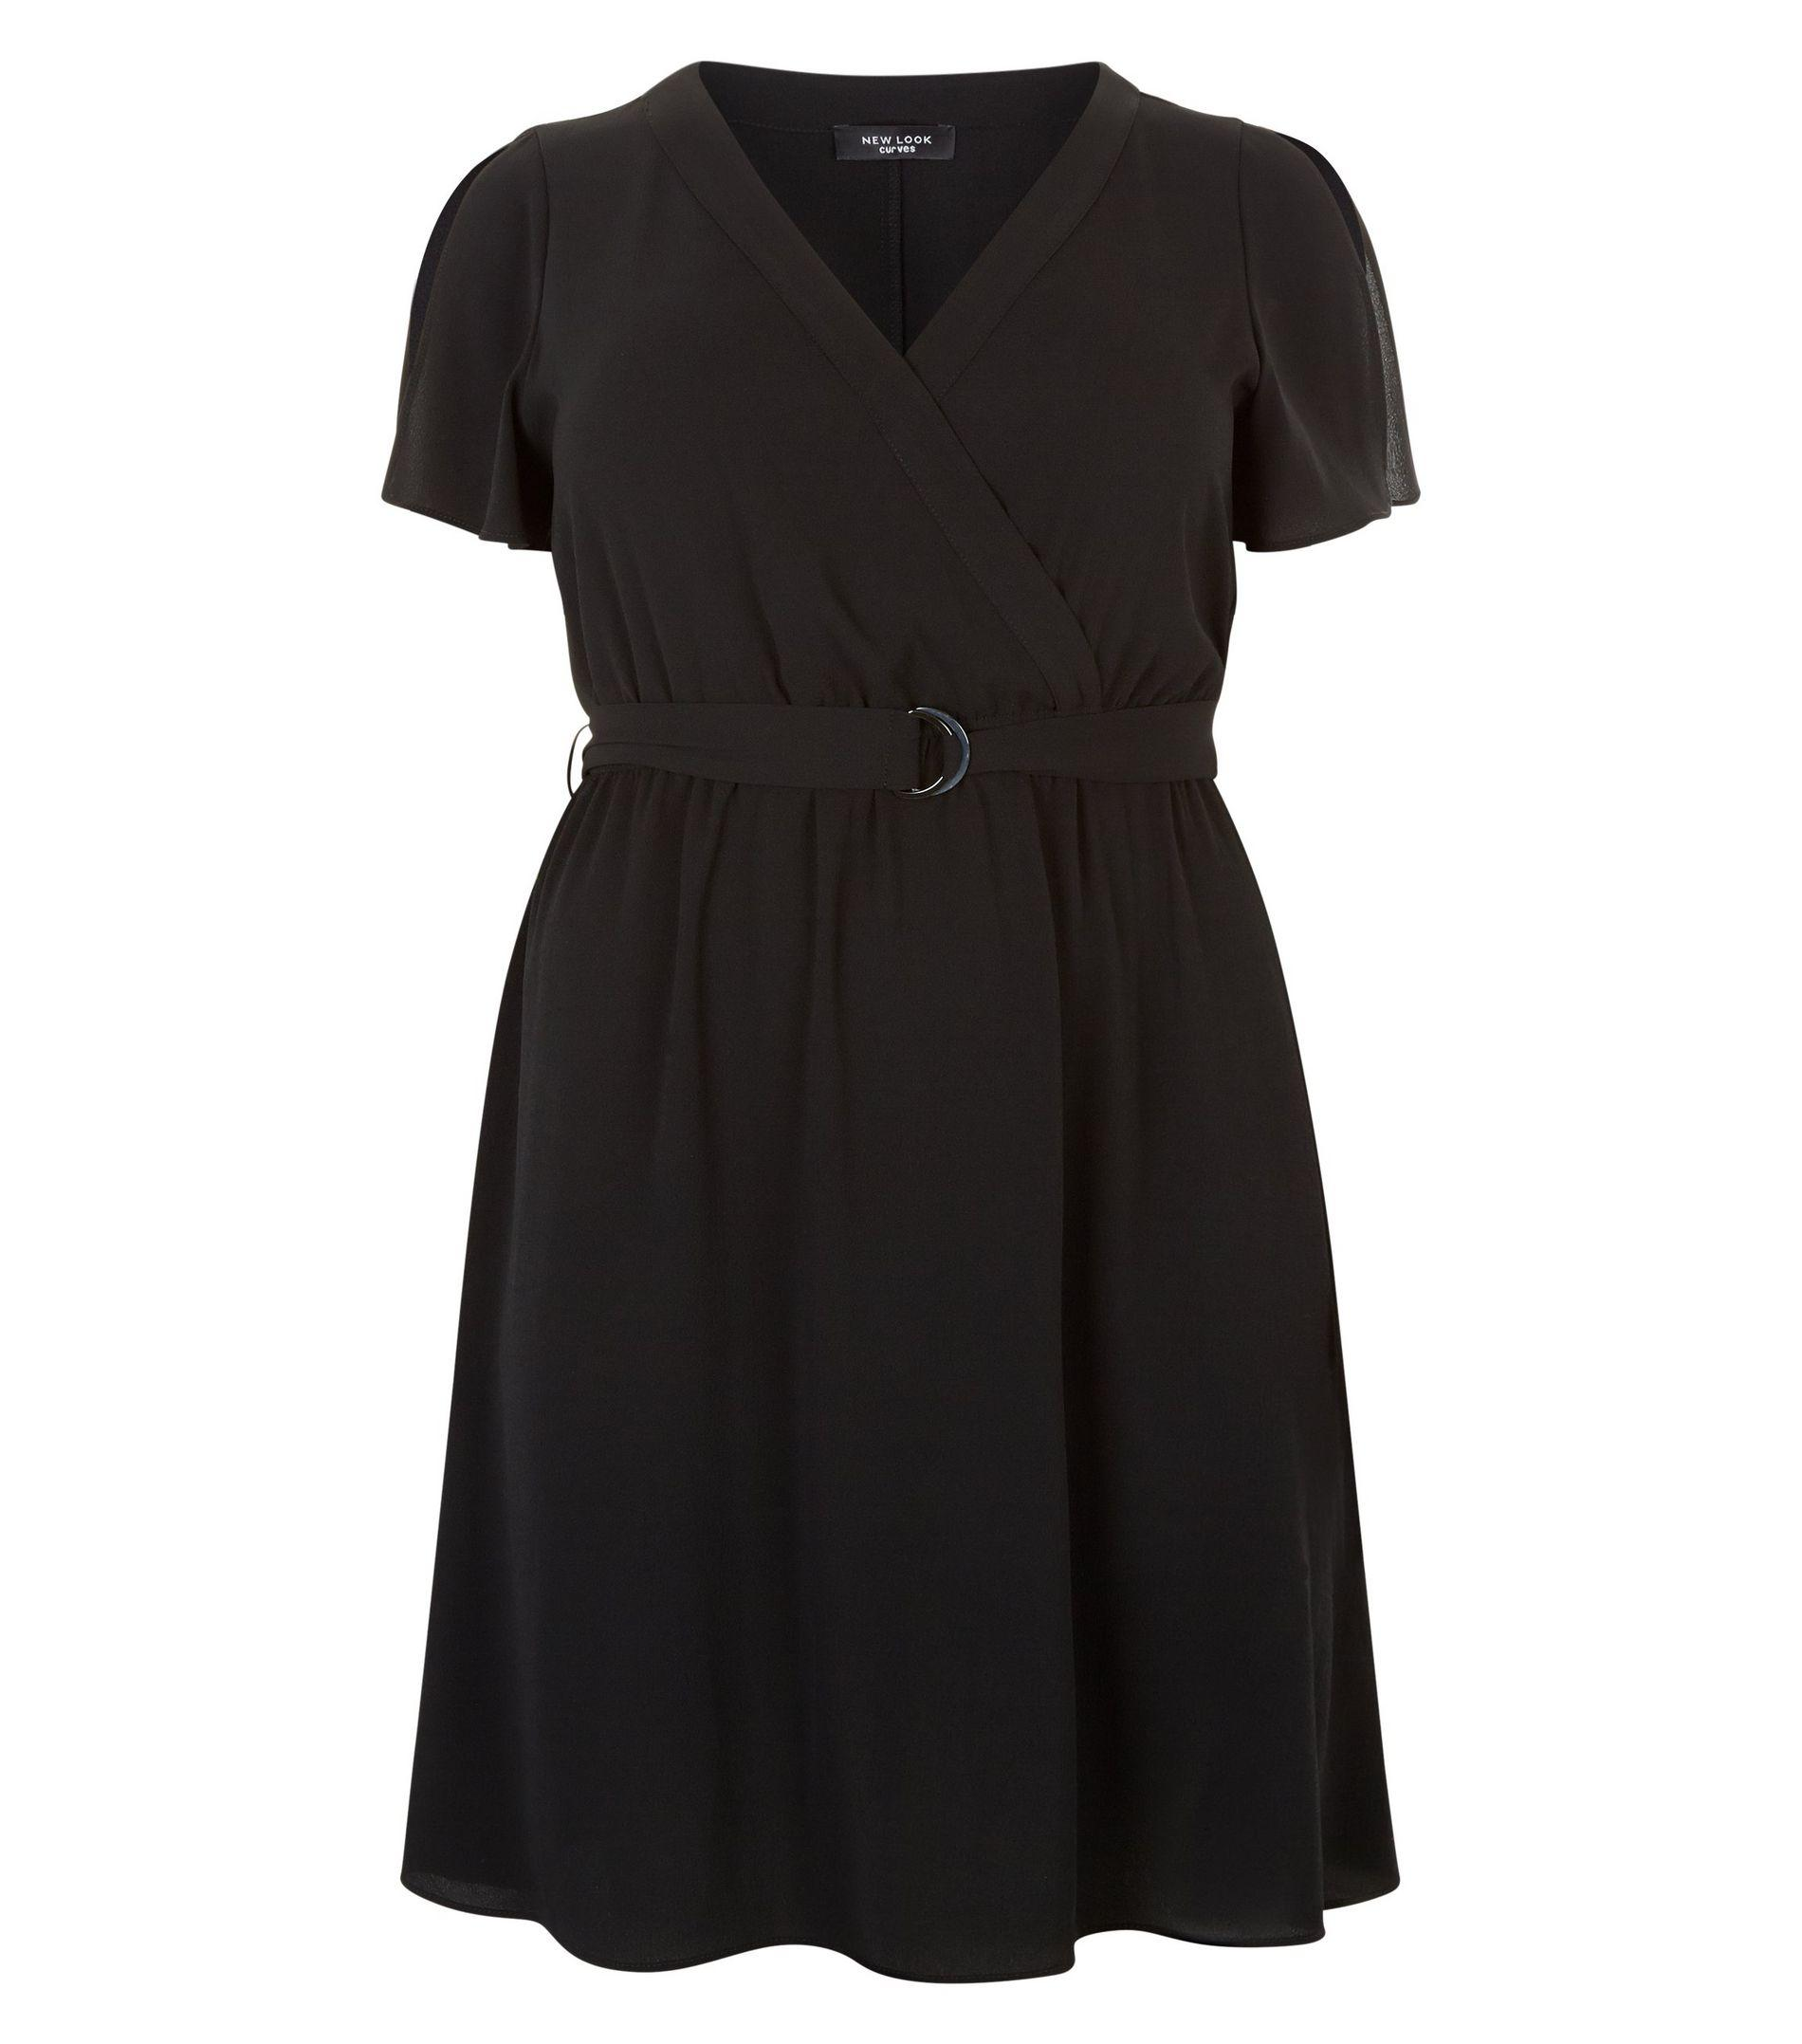 b9dd755bc84b New Look Curves Split Sleeve Wrap Front Dress in Black - Lyst